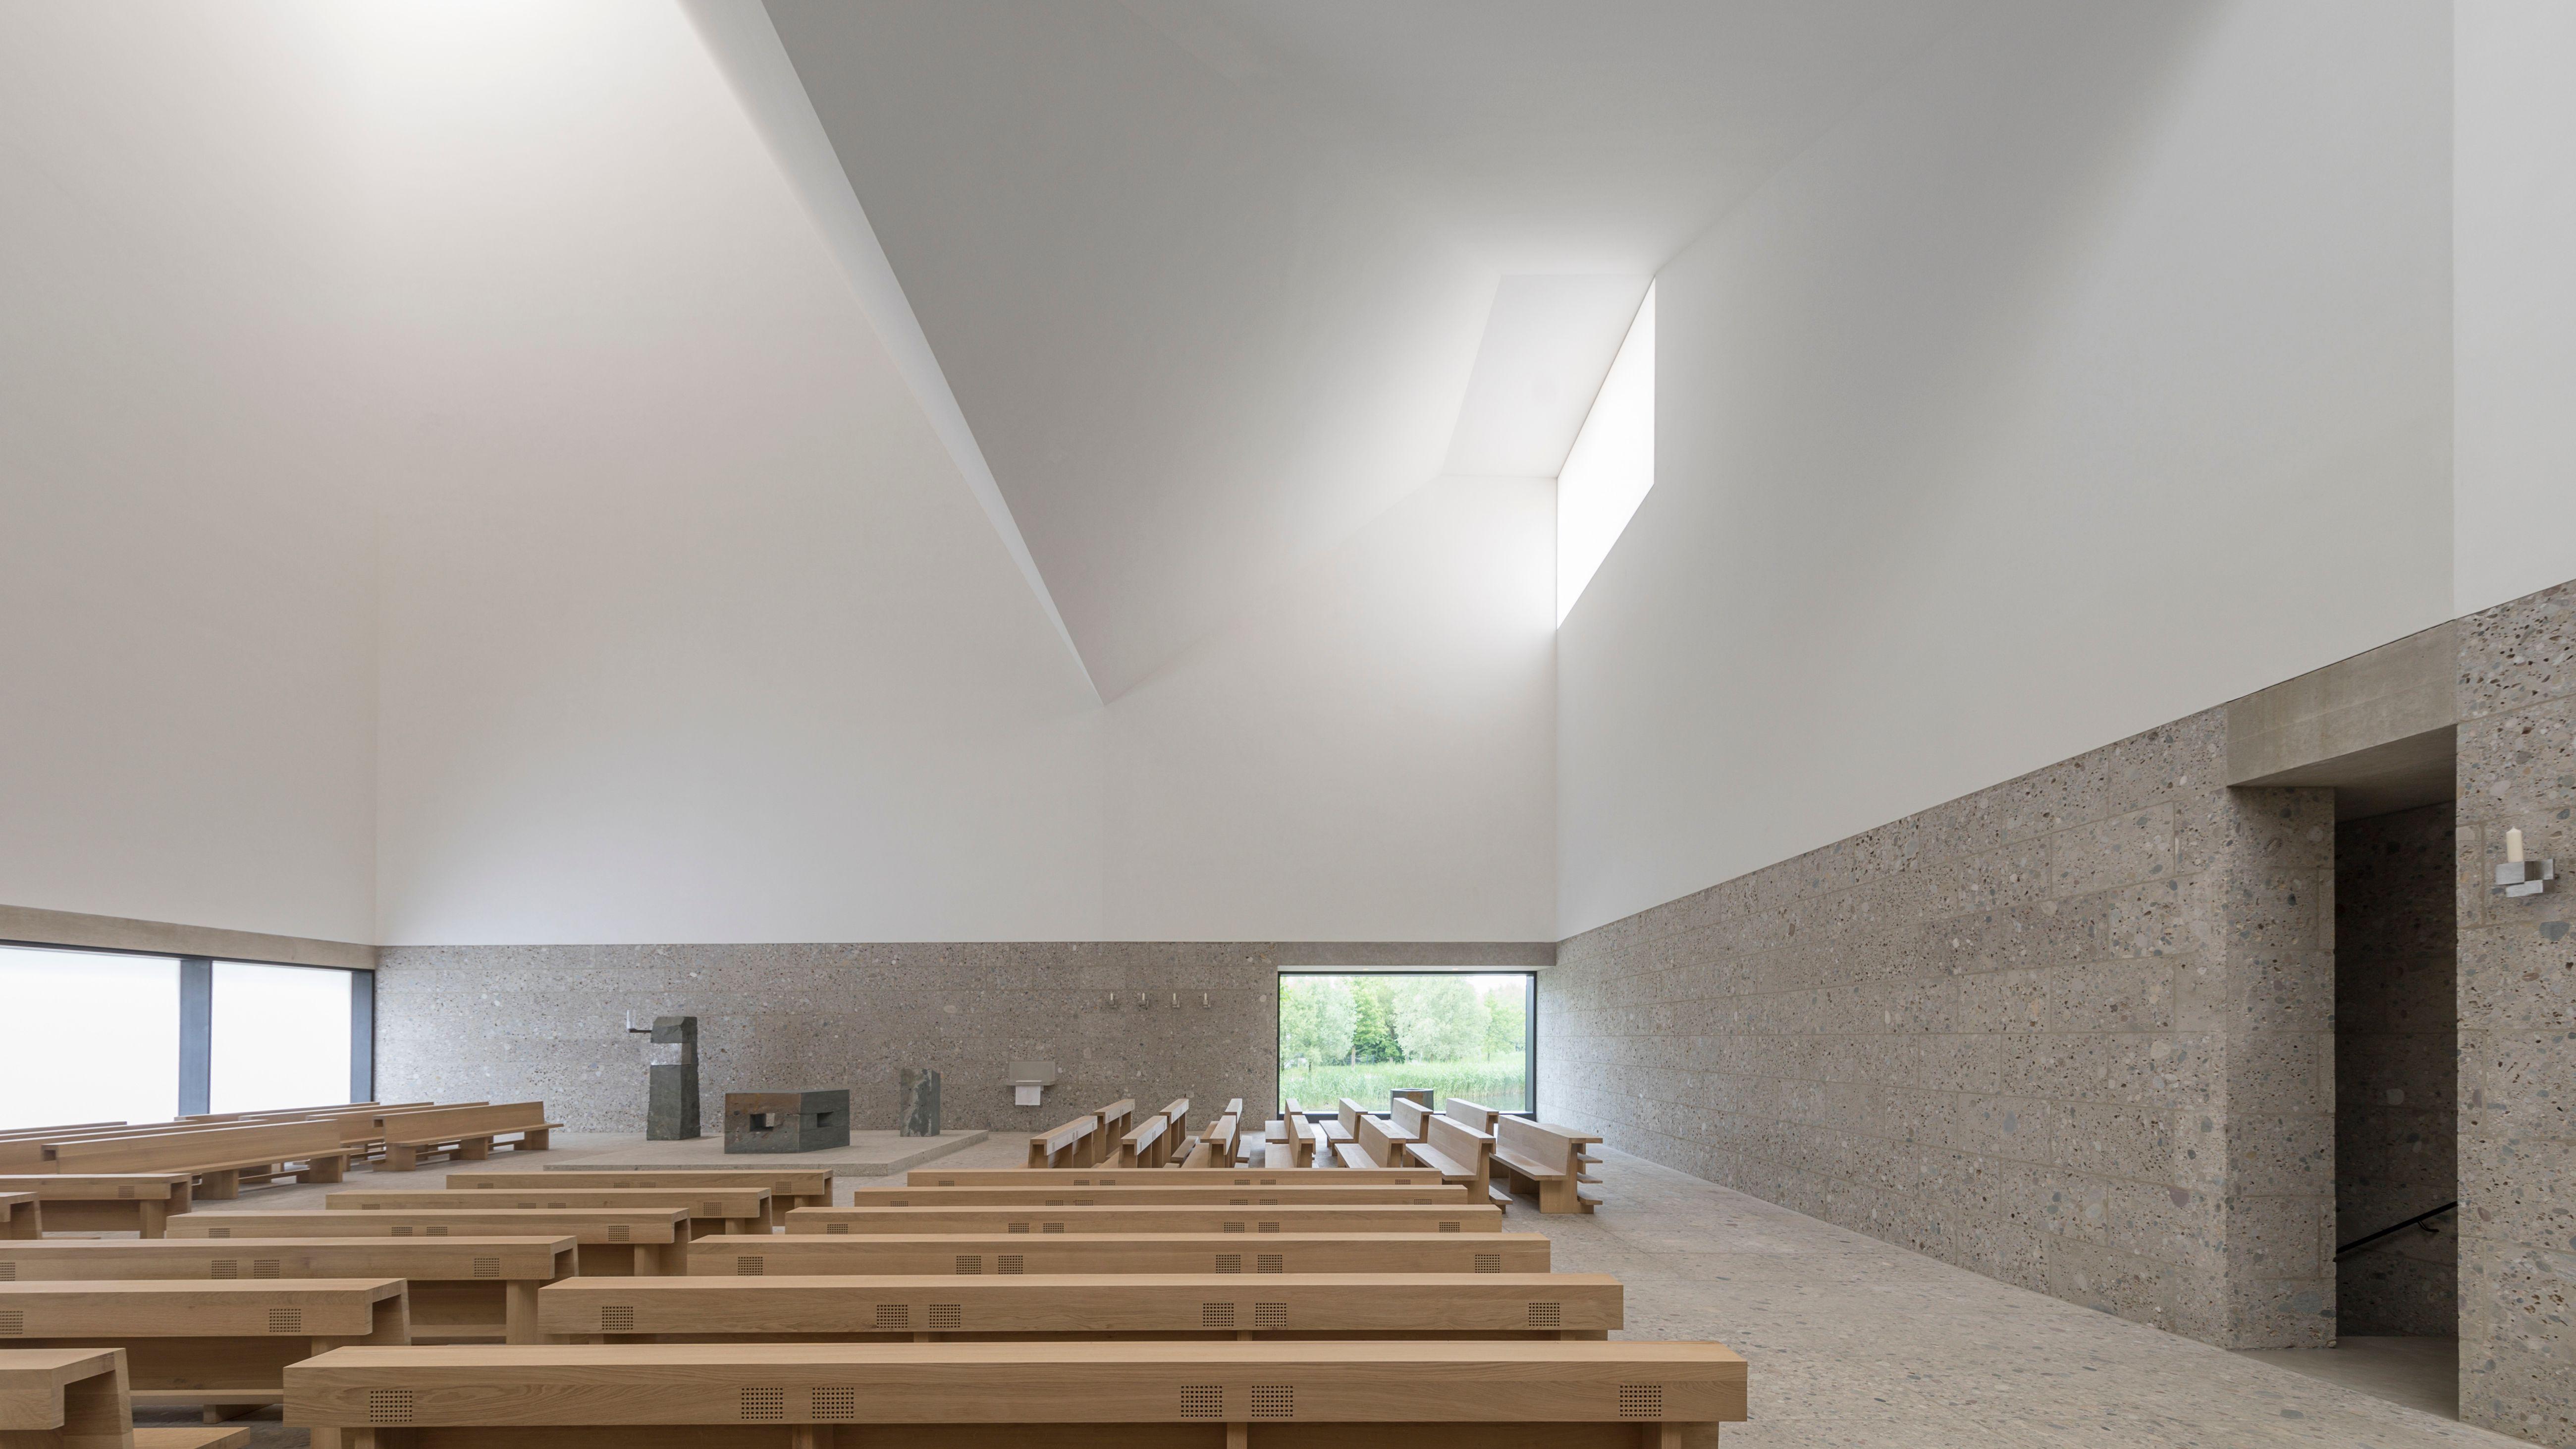 Innenraum des Kirchenzentrums Sel. Rupert Mayer in Poing, Landkreis Ebersberg.